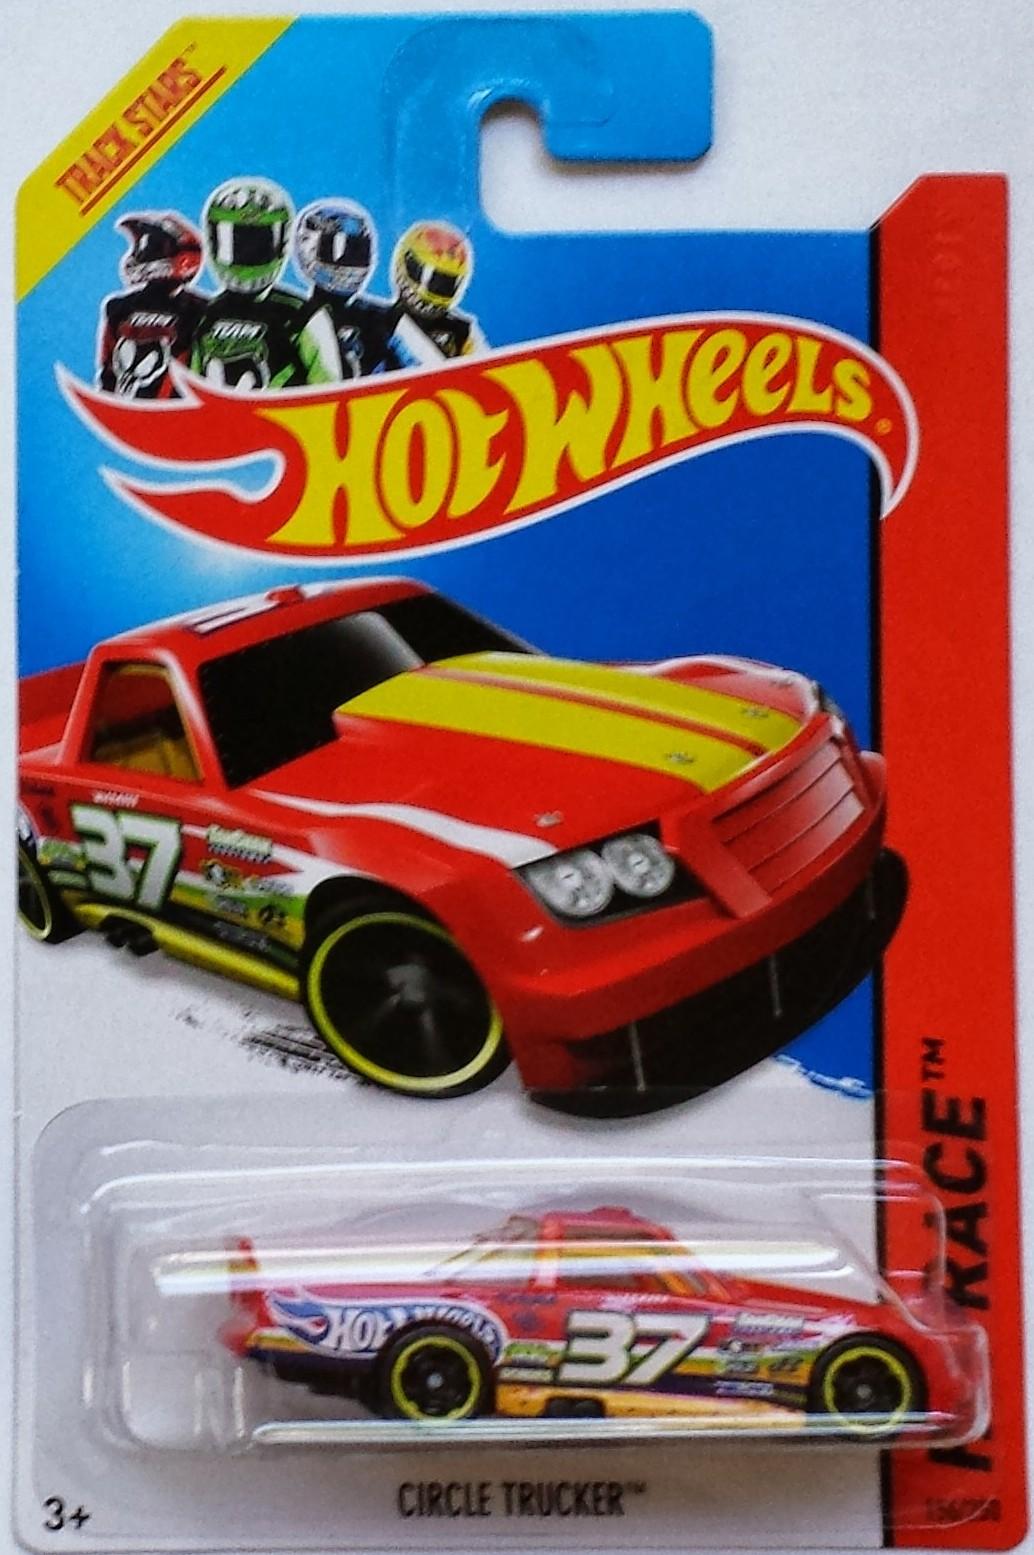 Image - 2014 156 Circle Trucker.jpg - Hot Wheels Wiki